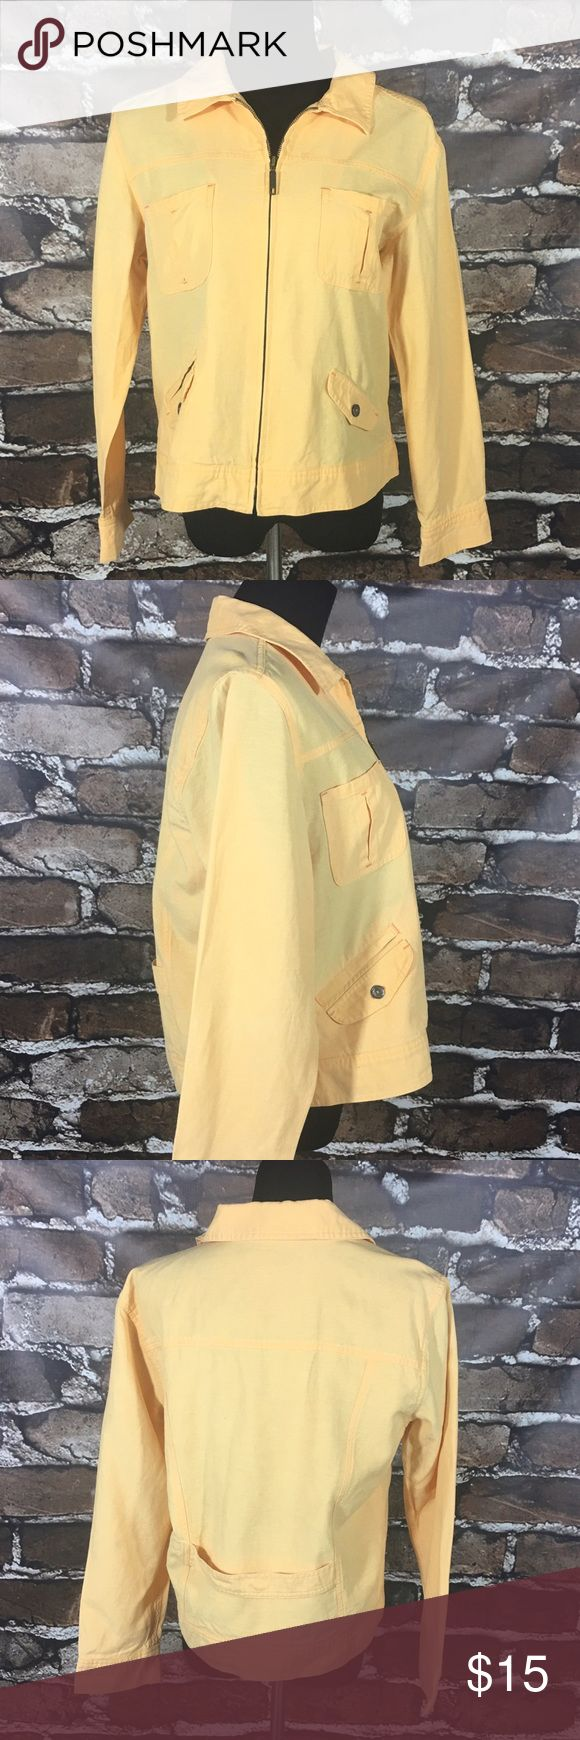 J. Jill Sherbet Orange Jacket Women's jacket from J. Jill. Sherbet orange. Long sleeve. Zip up. Collared. Lightweight. Women's size medium.  52% lyocell, 30% linen, 18% cotton. Lining: 100% cotton.  No rips, tears, stains, or flaws. From a smoke free home.  B022 J. Jill Jackets & Coats